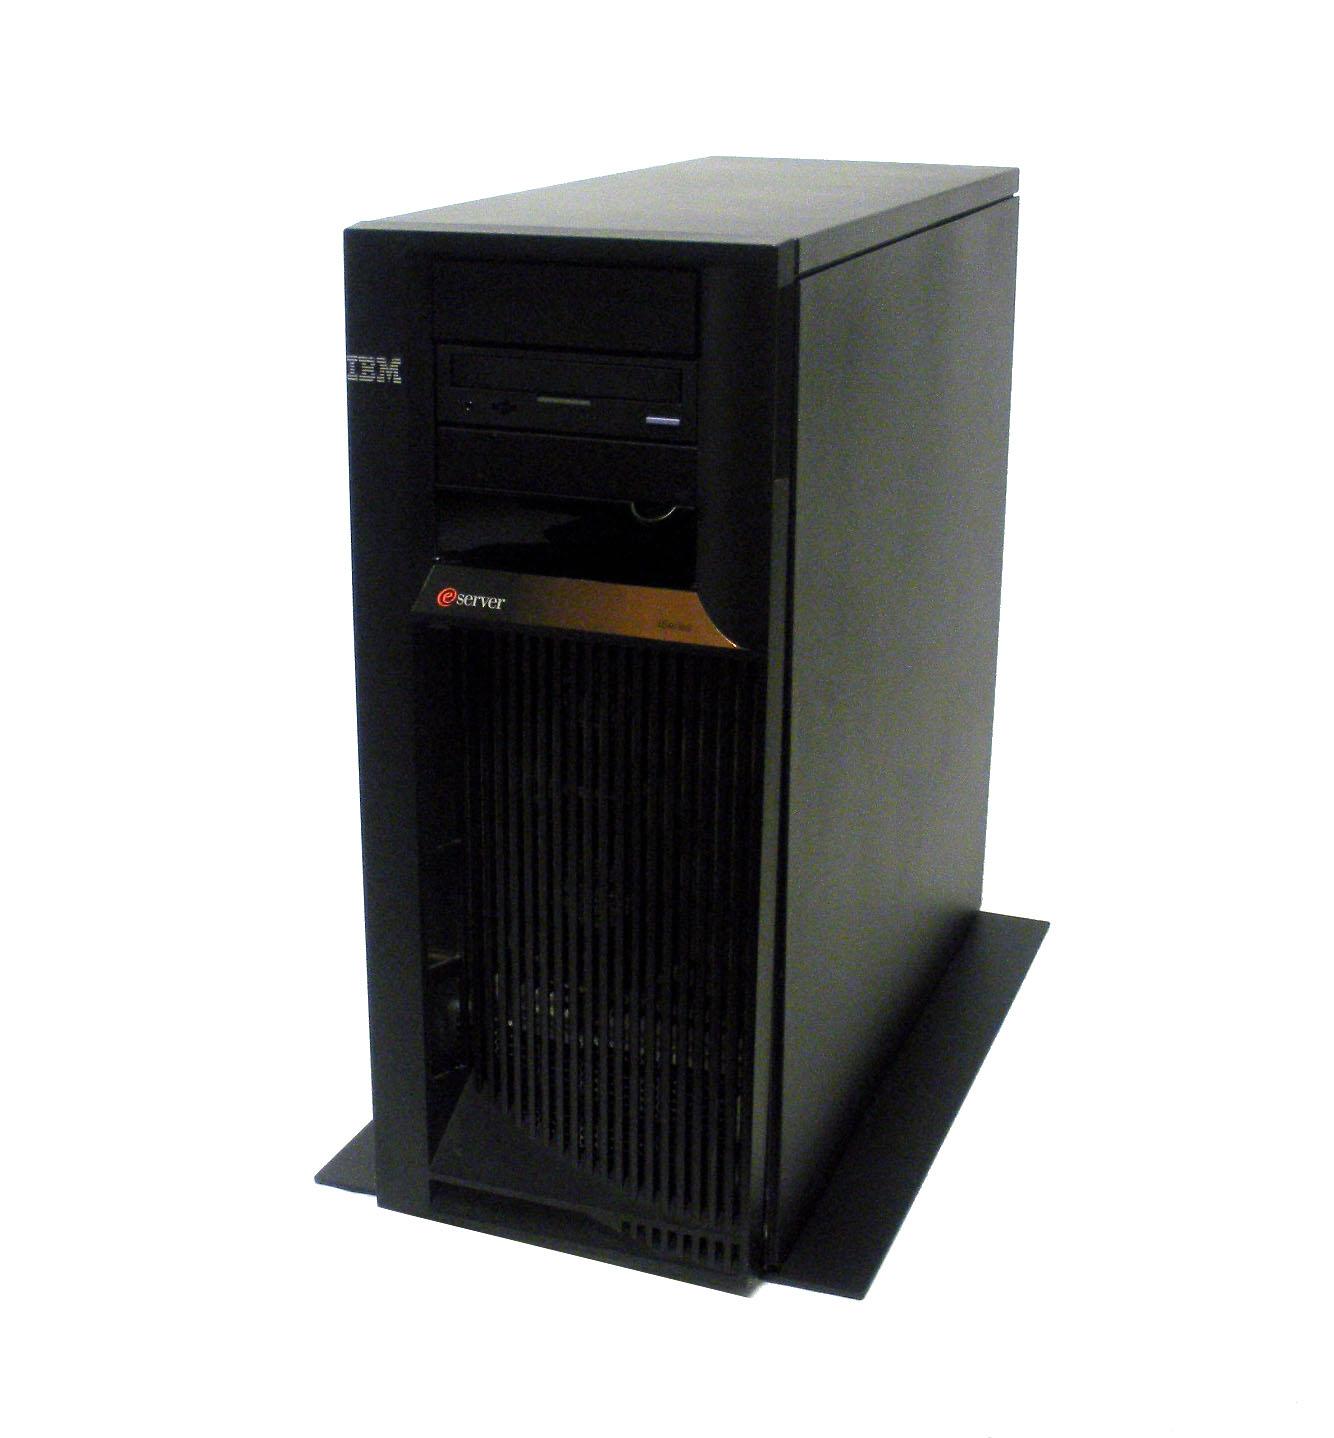 Flagship | IBM 2432-9406 1070 CPW 270 SYSTEM UNIT 04N5166 VPD CARD via Flagship Tech